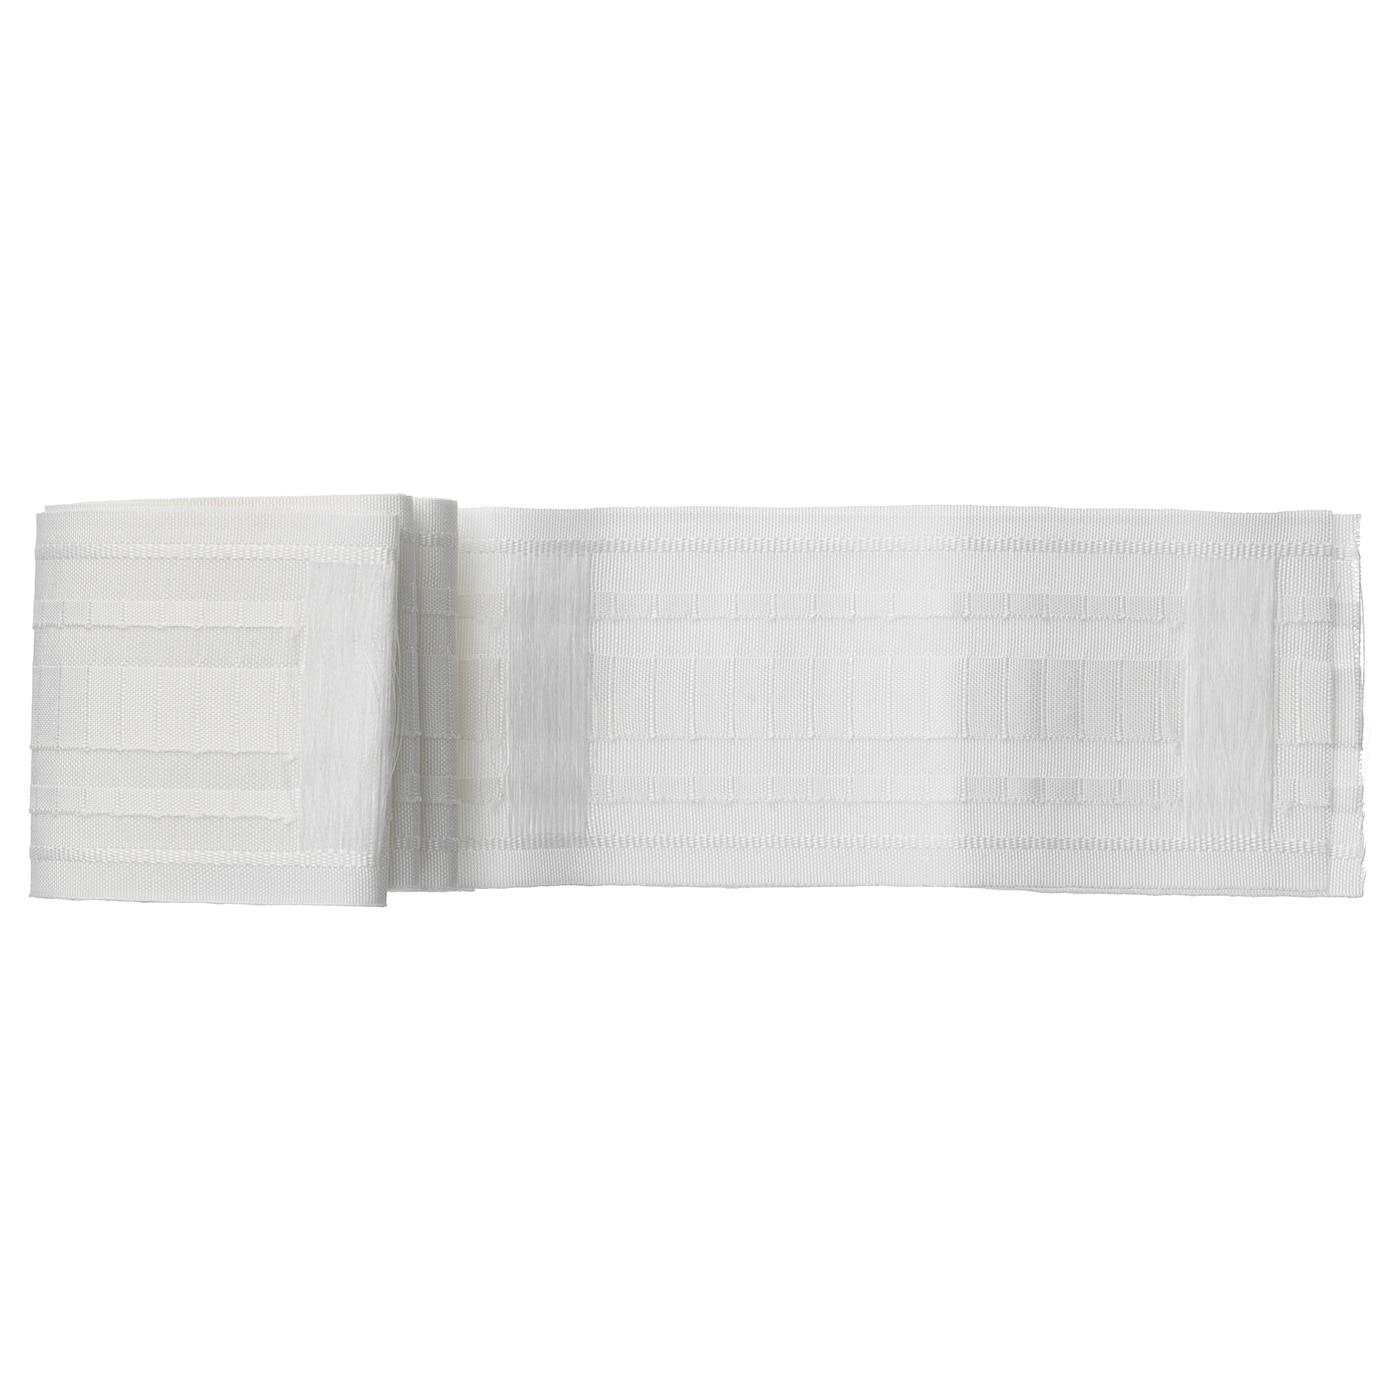 KRONILL Gordijnband Wit 8.5 x 310 cm - IKEA